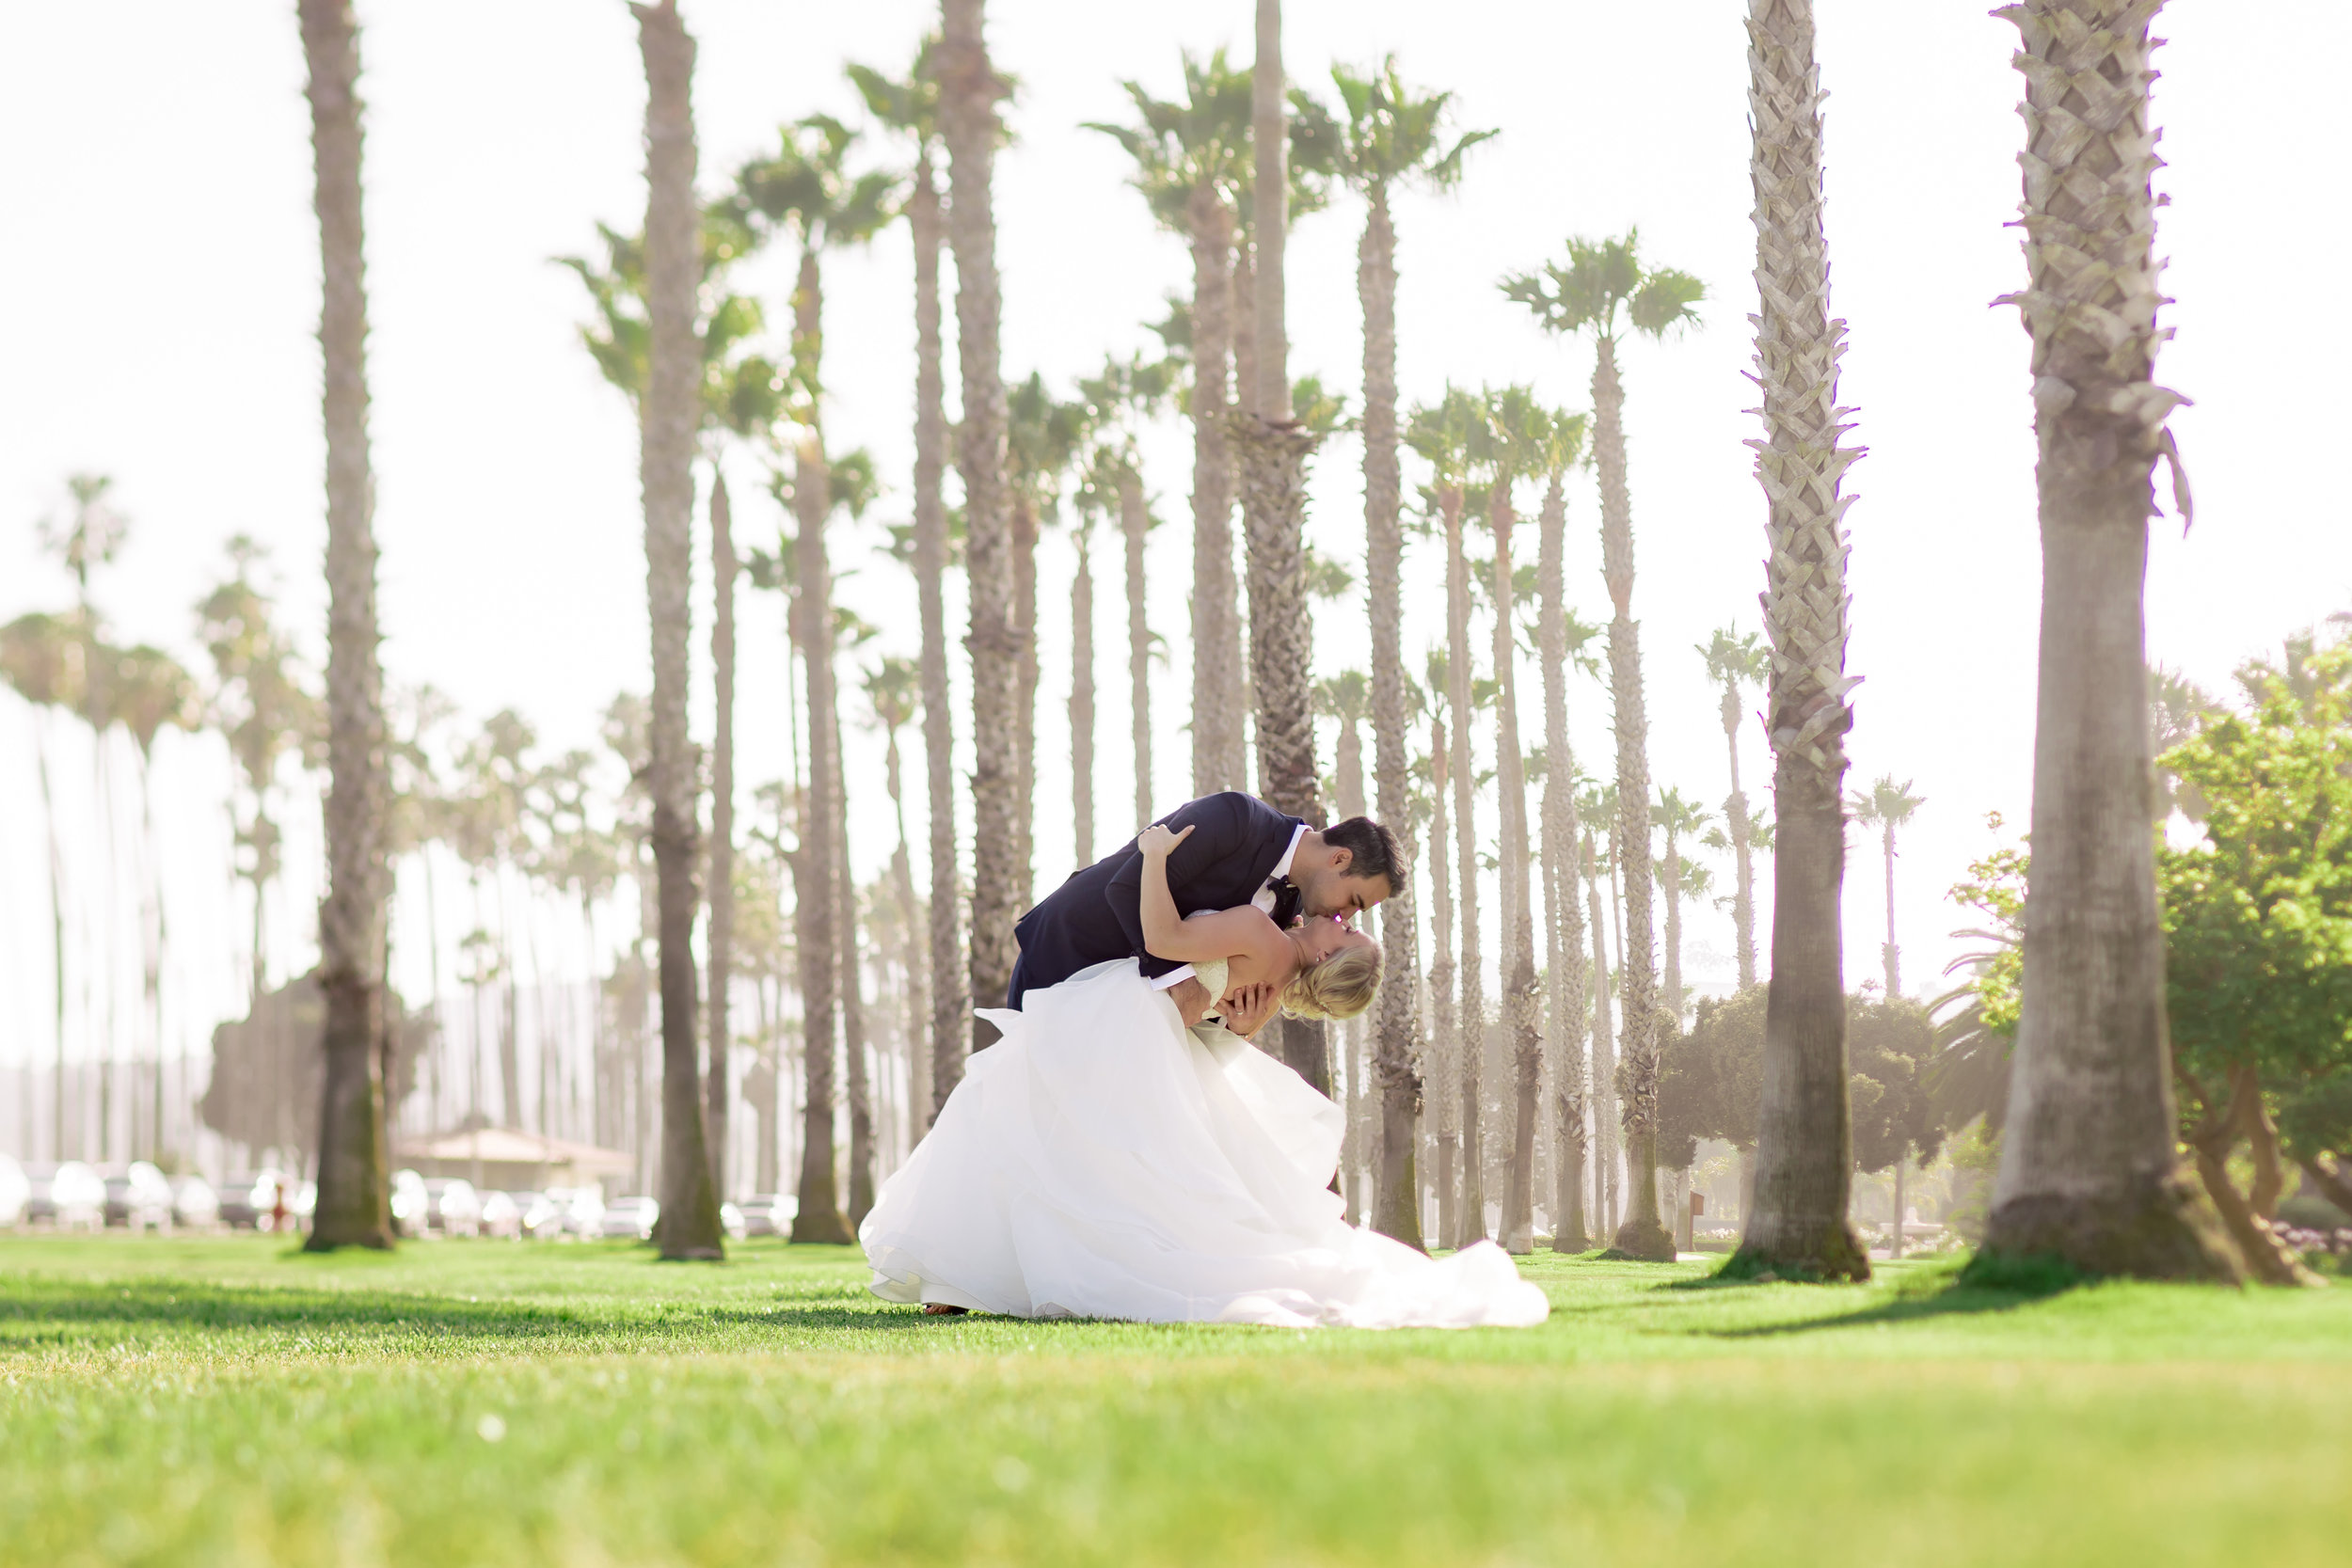 www.santabarbarawedding.com   Rewind Photography   Hilton Santa Barbara Beachfront Resort   Events by M and M   Bride and Groom